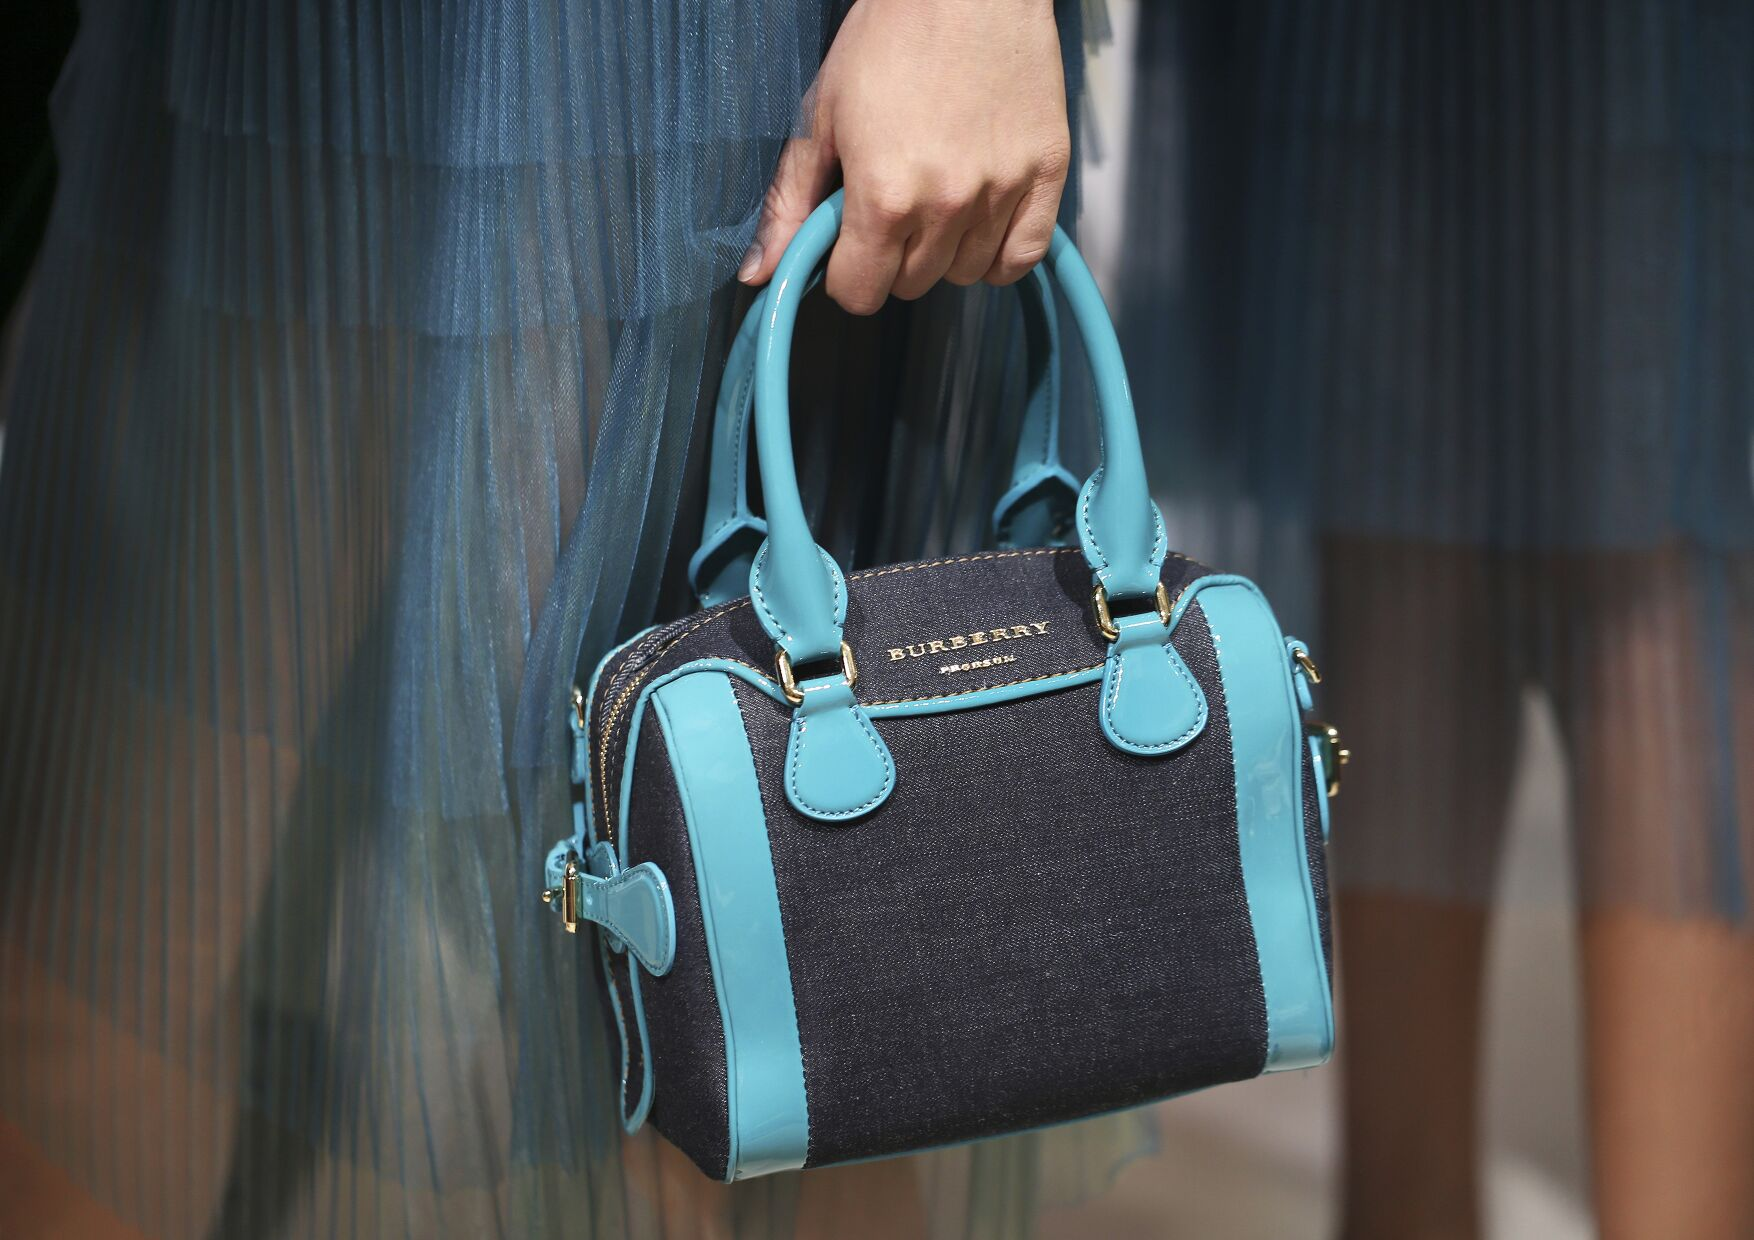 Backstage Burberry Prorsum Bag Womenswear Trends